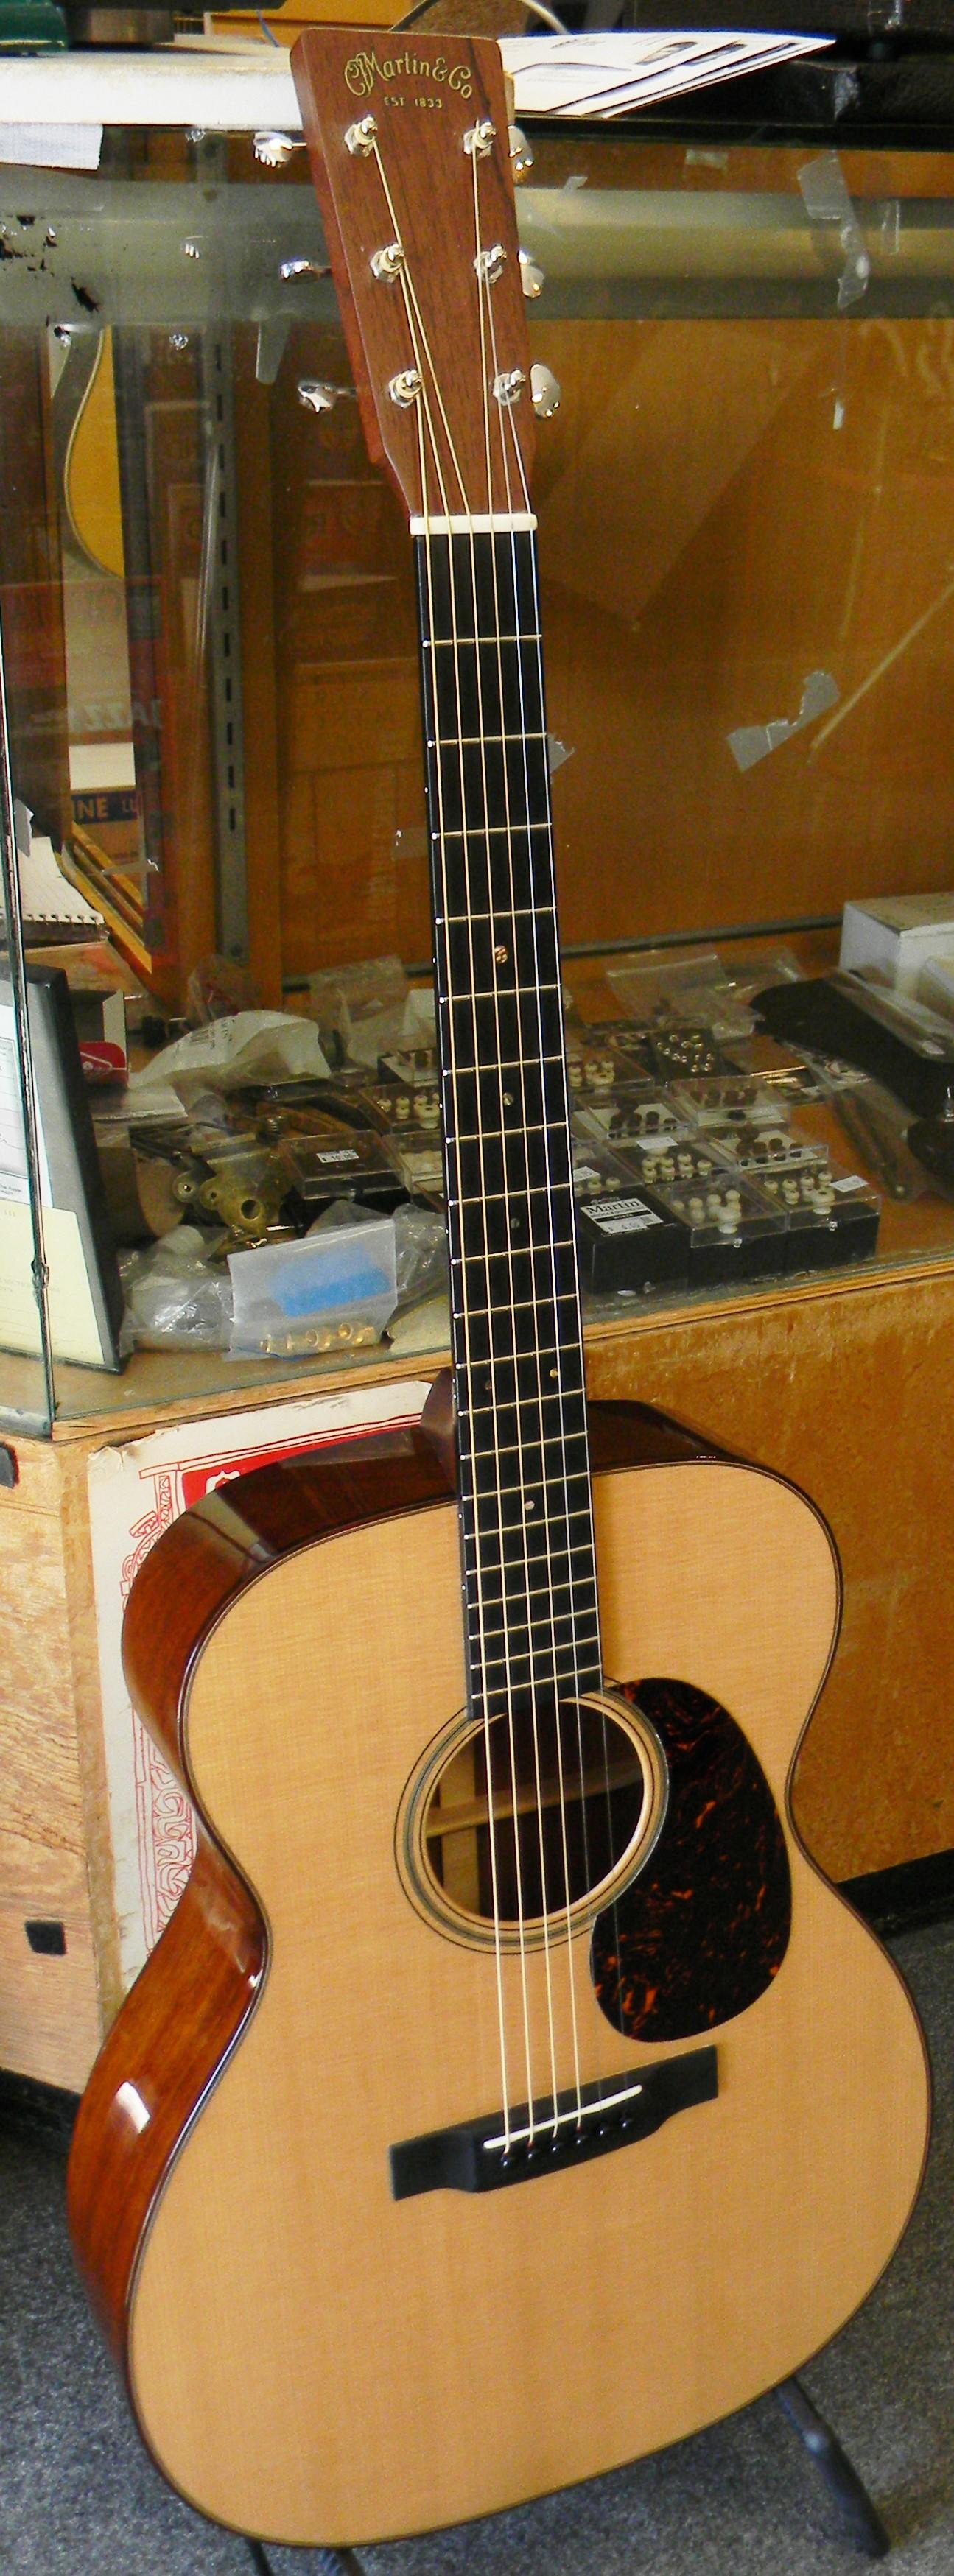 dscn0124 san antonio guitar store guitar tex. Black Bedroom Furniture Sets. Home Design Ideas